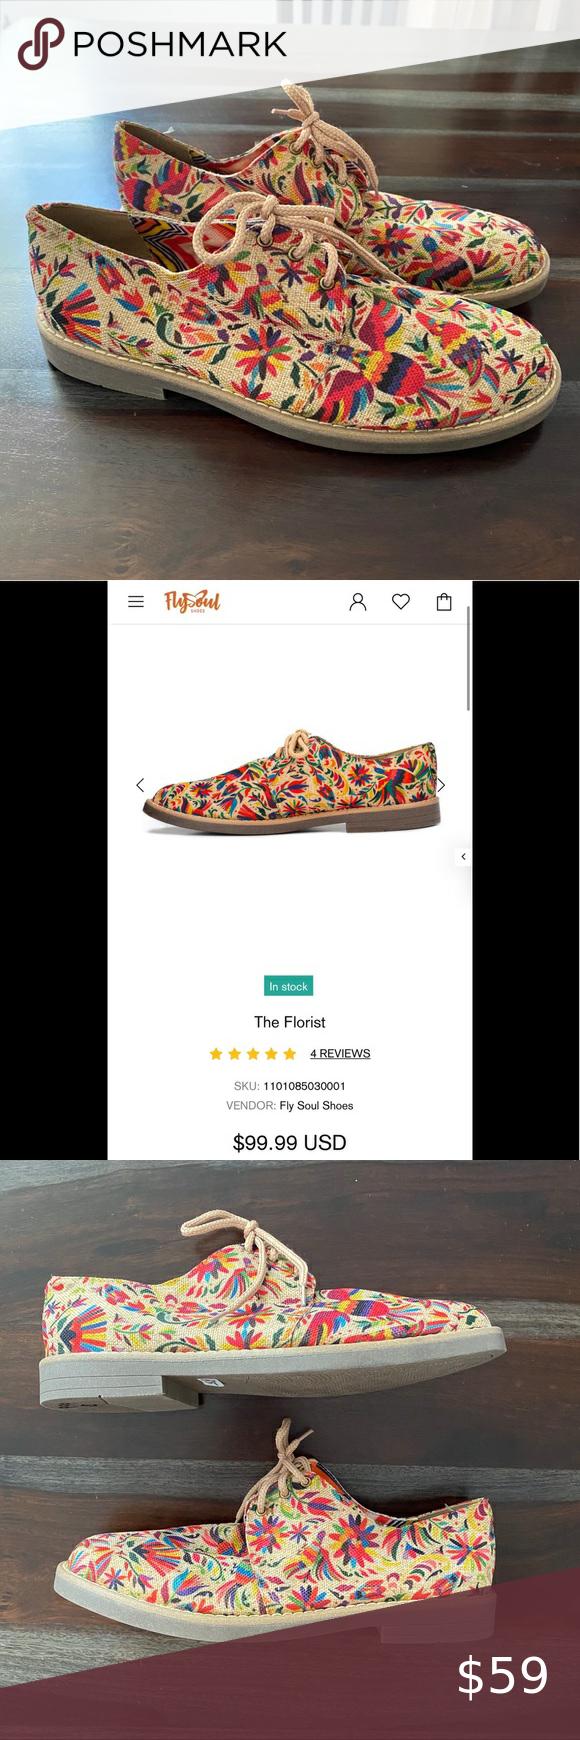 Fly Souls hemp shoes the florist size 8